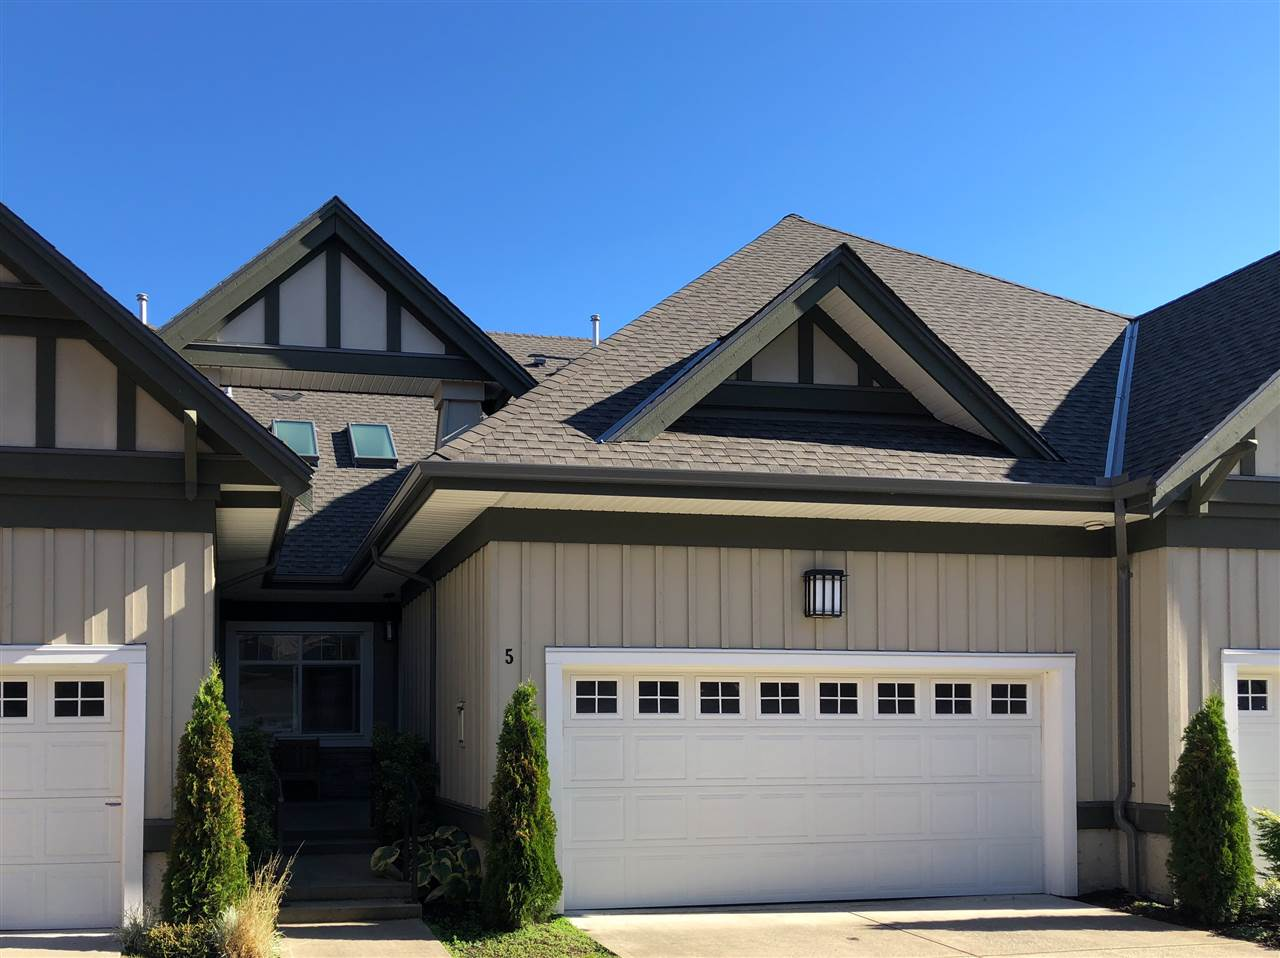 Buliding: 14968 24 Avenue, Surrey, BC